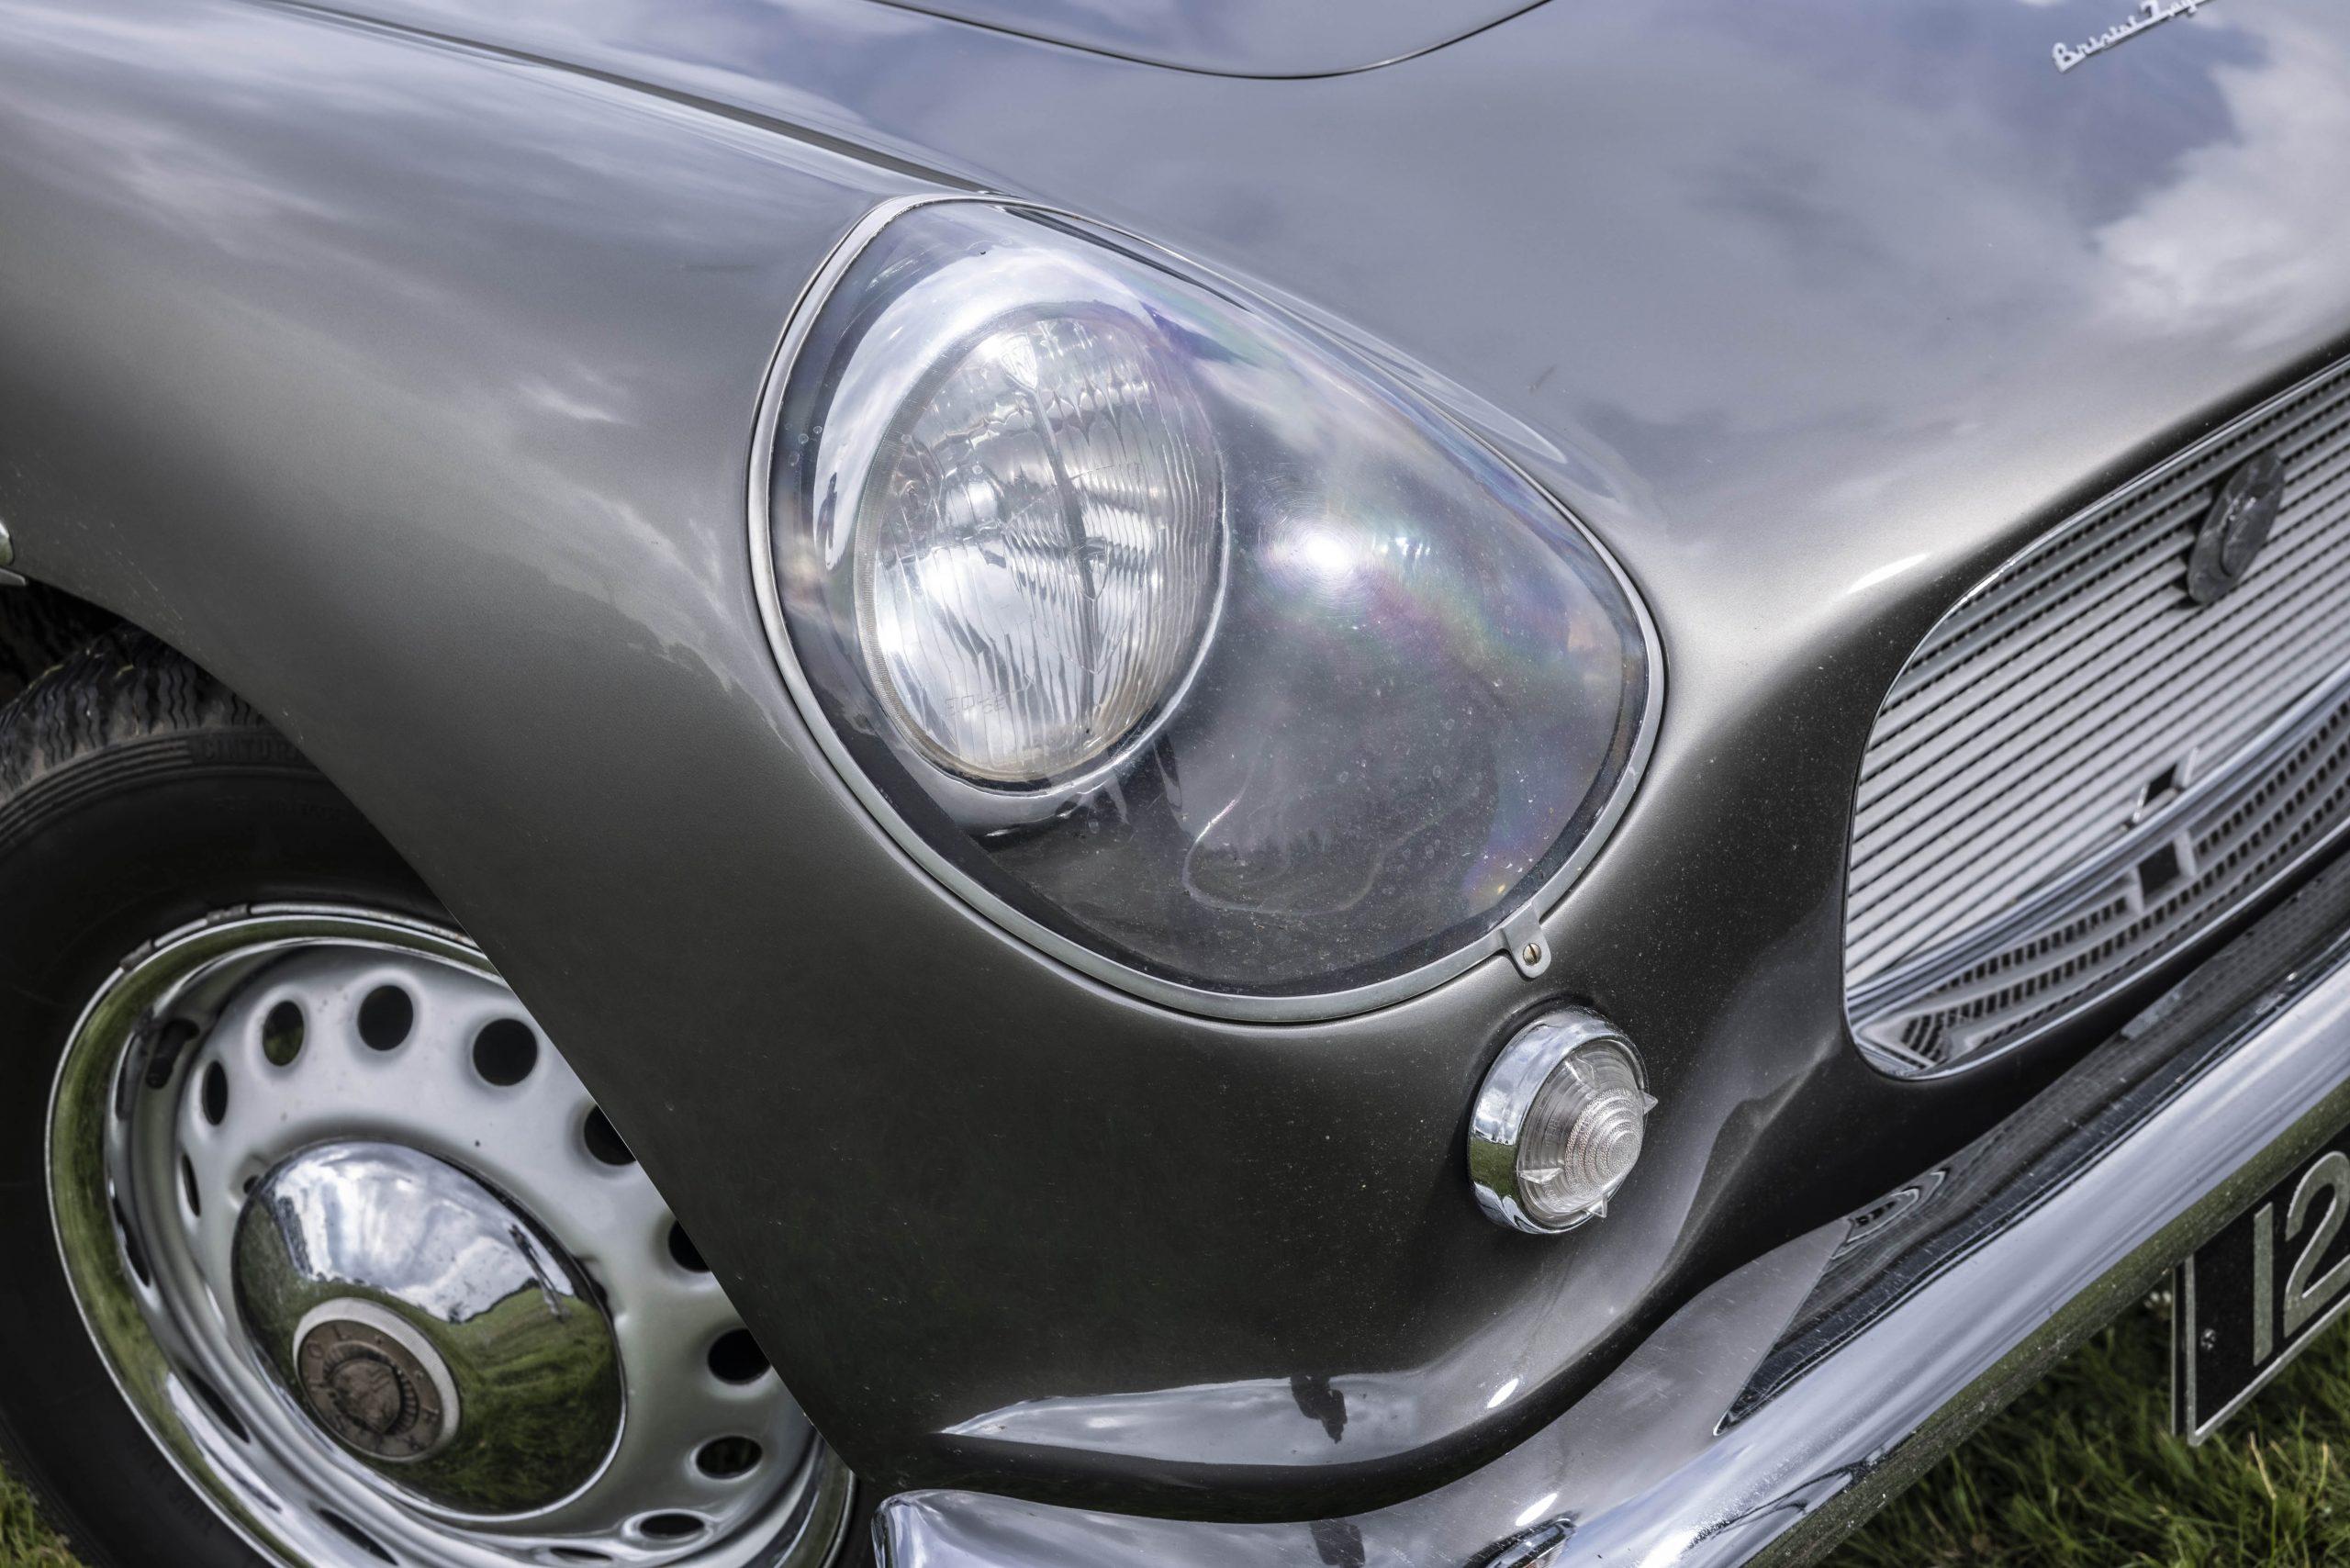 Zagato-bodied Bristol 406 headlight detail